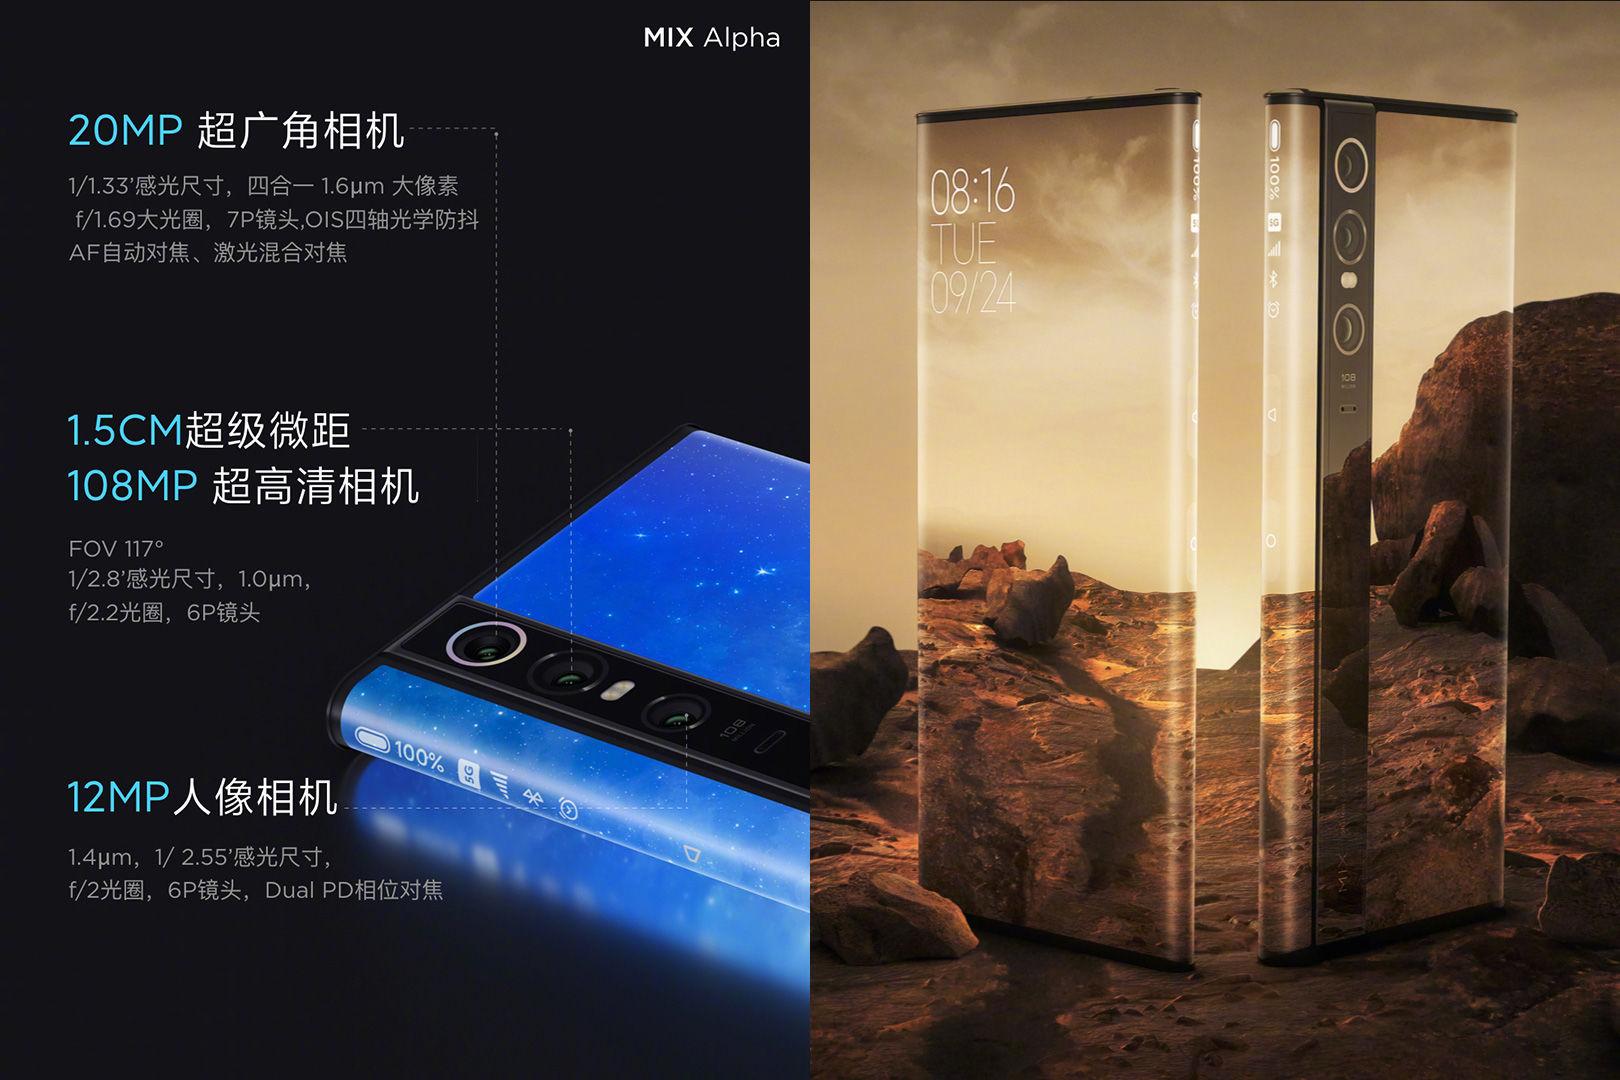 Xiaomi Mi Mix Alpha, %180 Ekran-Gövde Oranıyla Geliyor Xiaomi Mi Mix Alpha, %180 Ekran-Gövde Oranıyla Geliyor dims